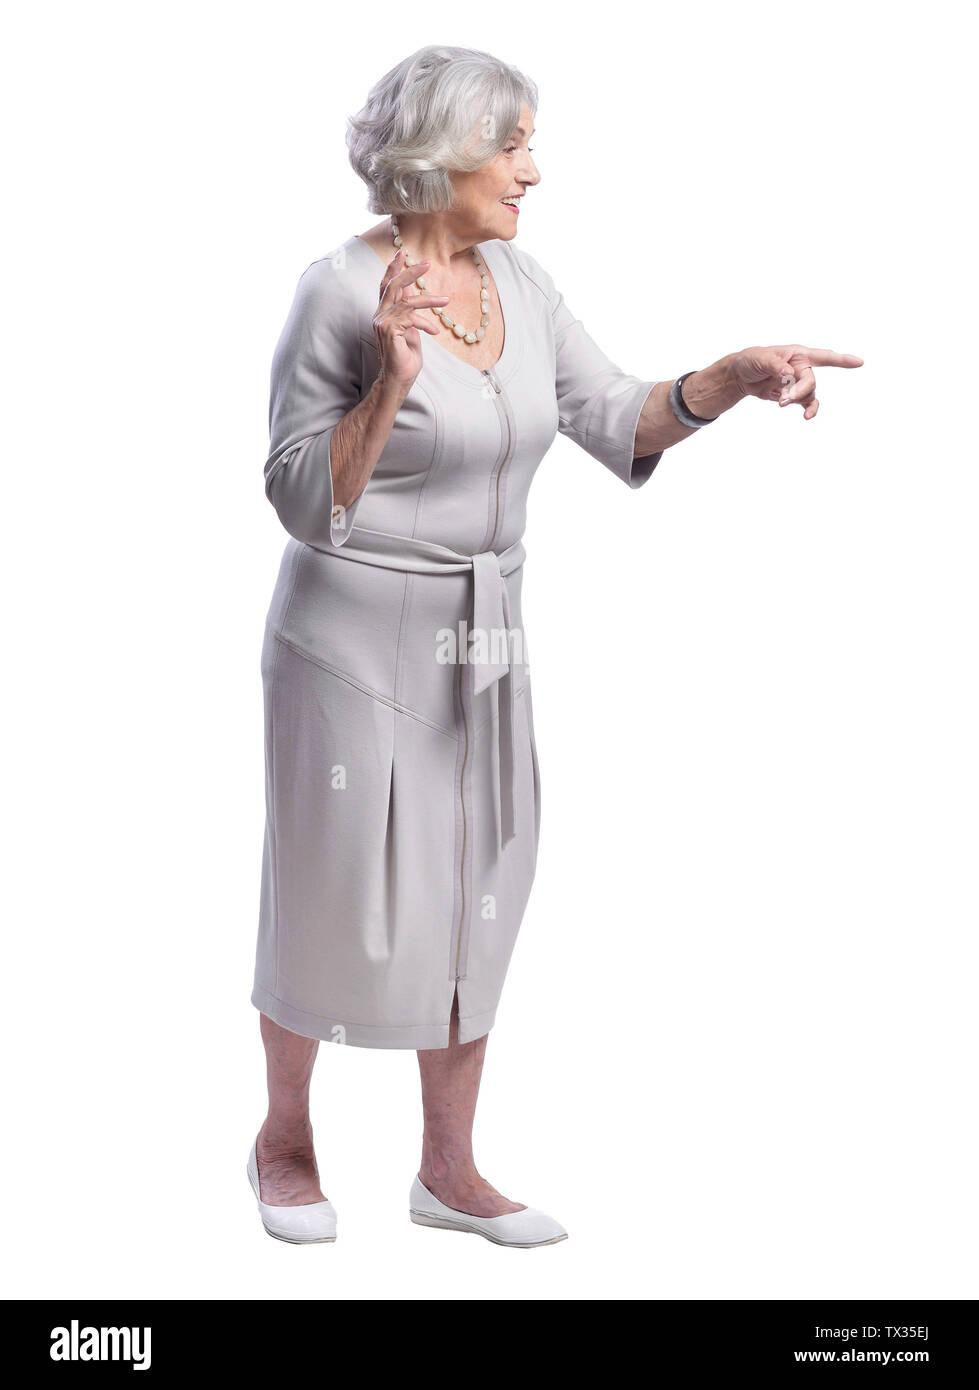 Smiling senior woman pointing isolated on white background - Stock Image